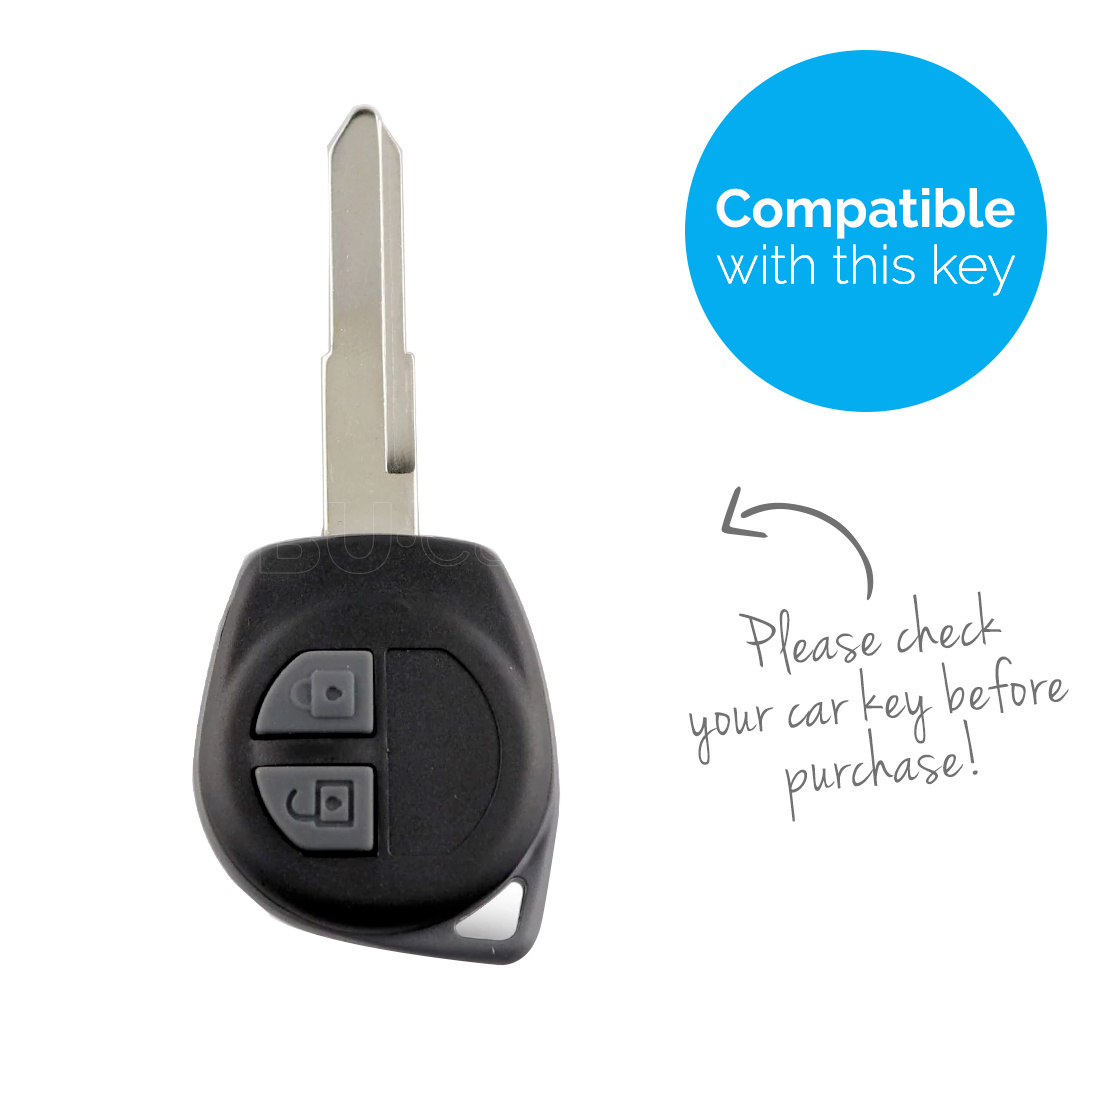 TBU car TBU car Sleutel cover compatibel met Suzuki - Silicone sleutelhoesje - beschermhoesje autosleutel - Roze